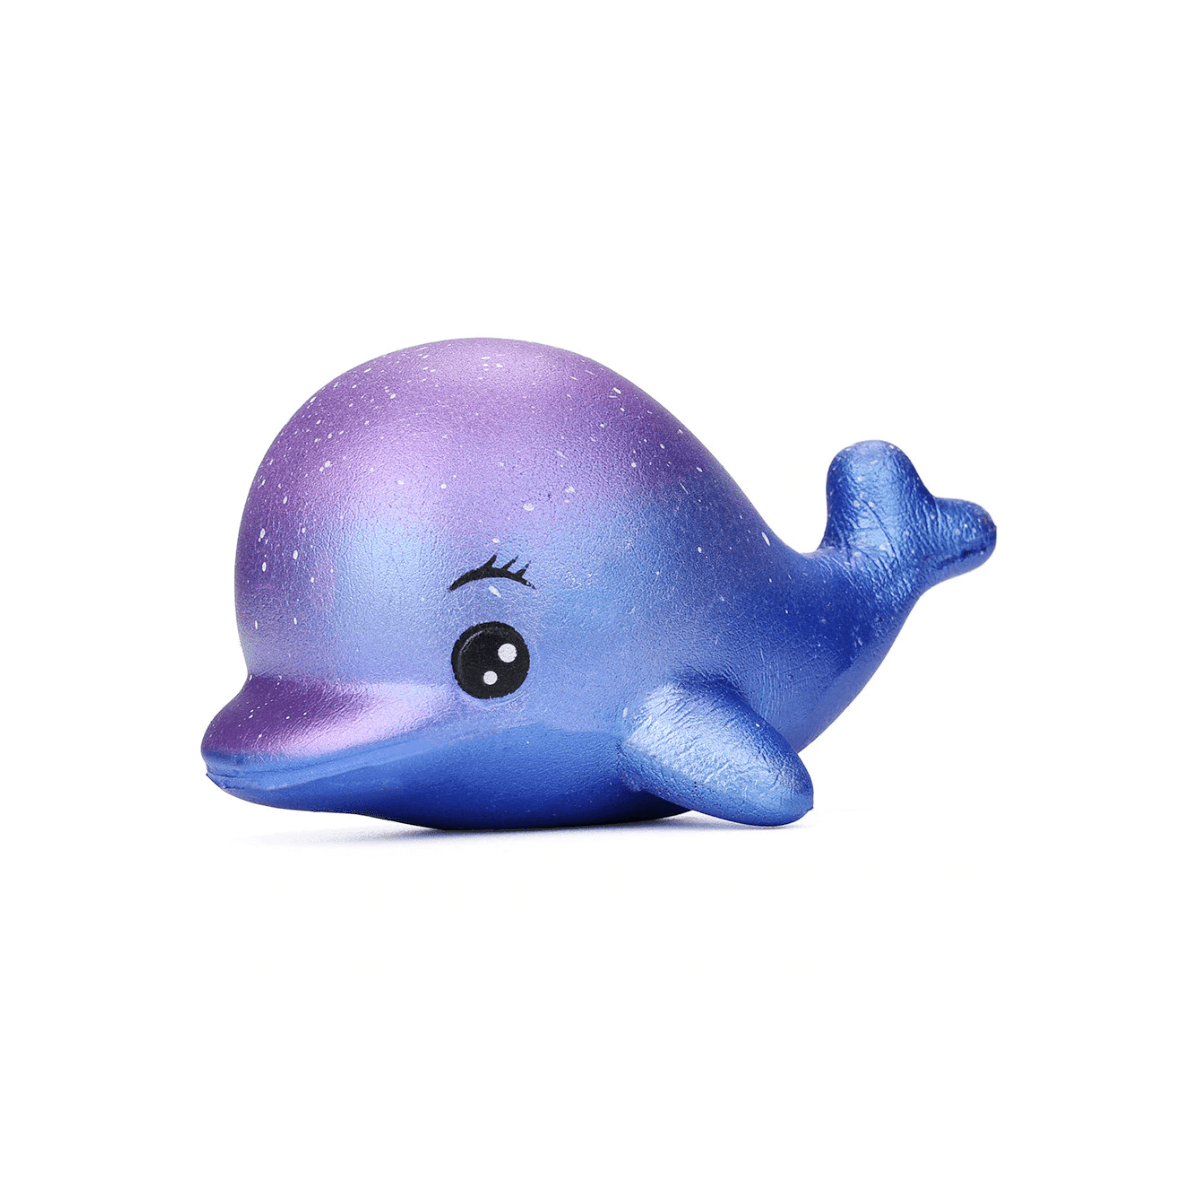 игрушка антистресс дельфин